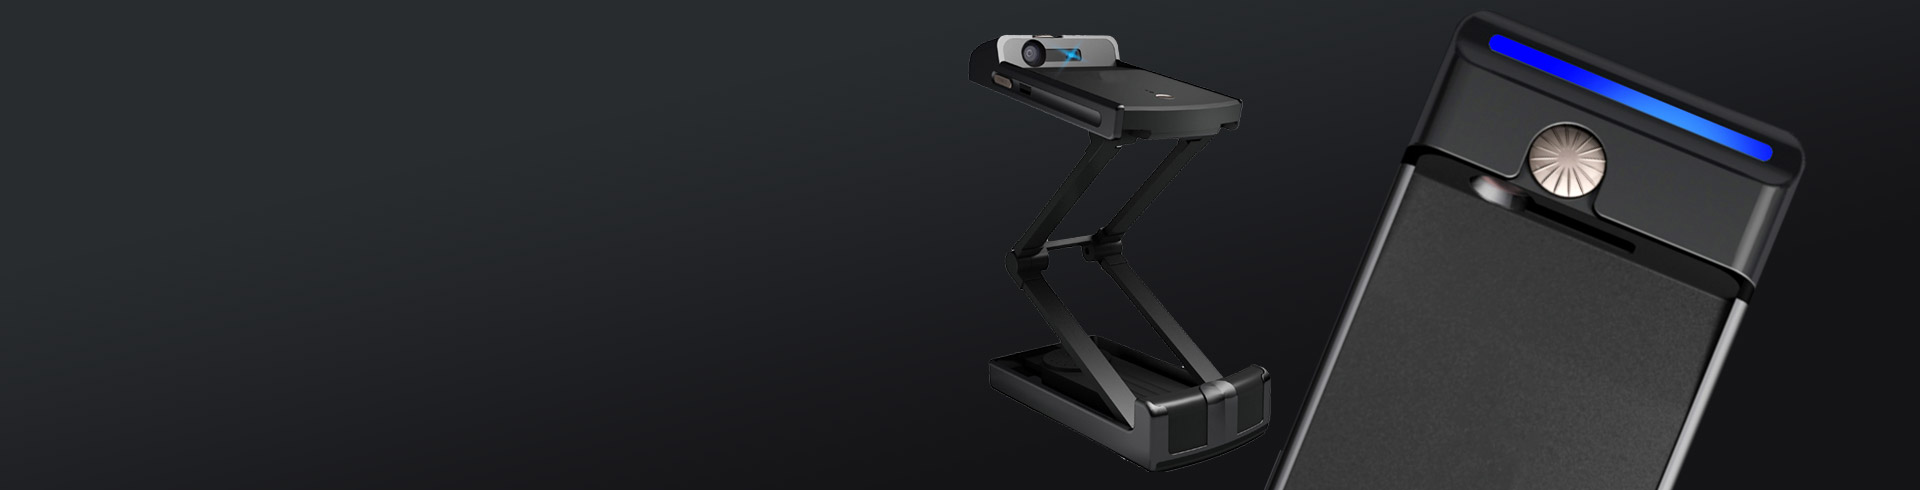 Desktouch Interactive Projector Yoga - Basic